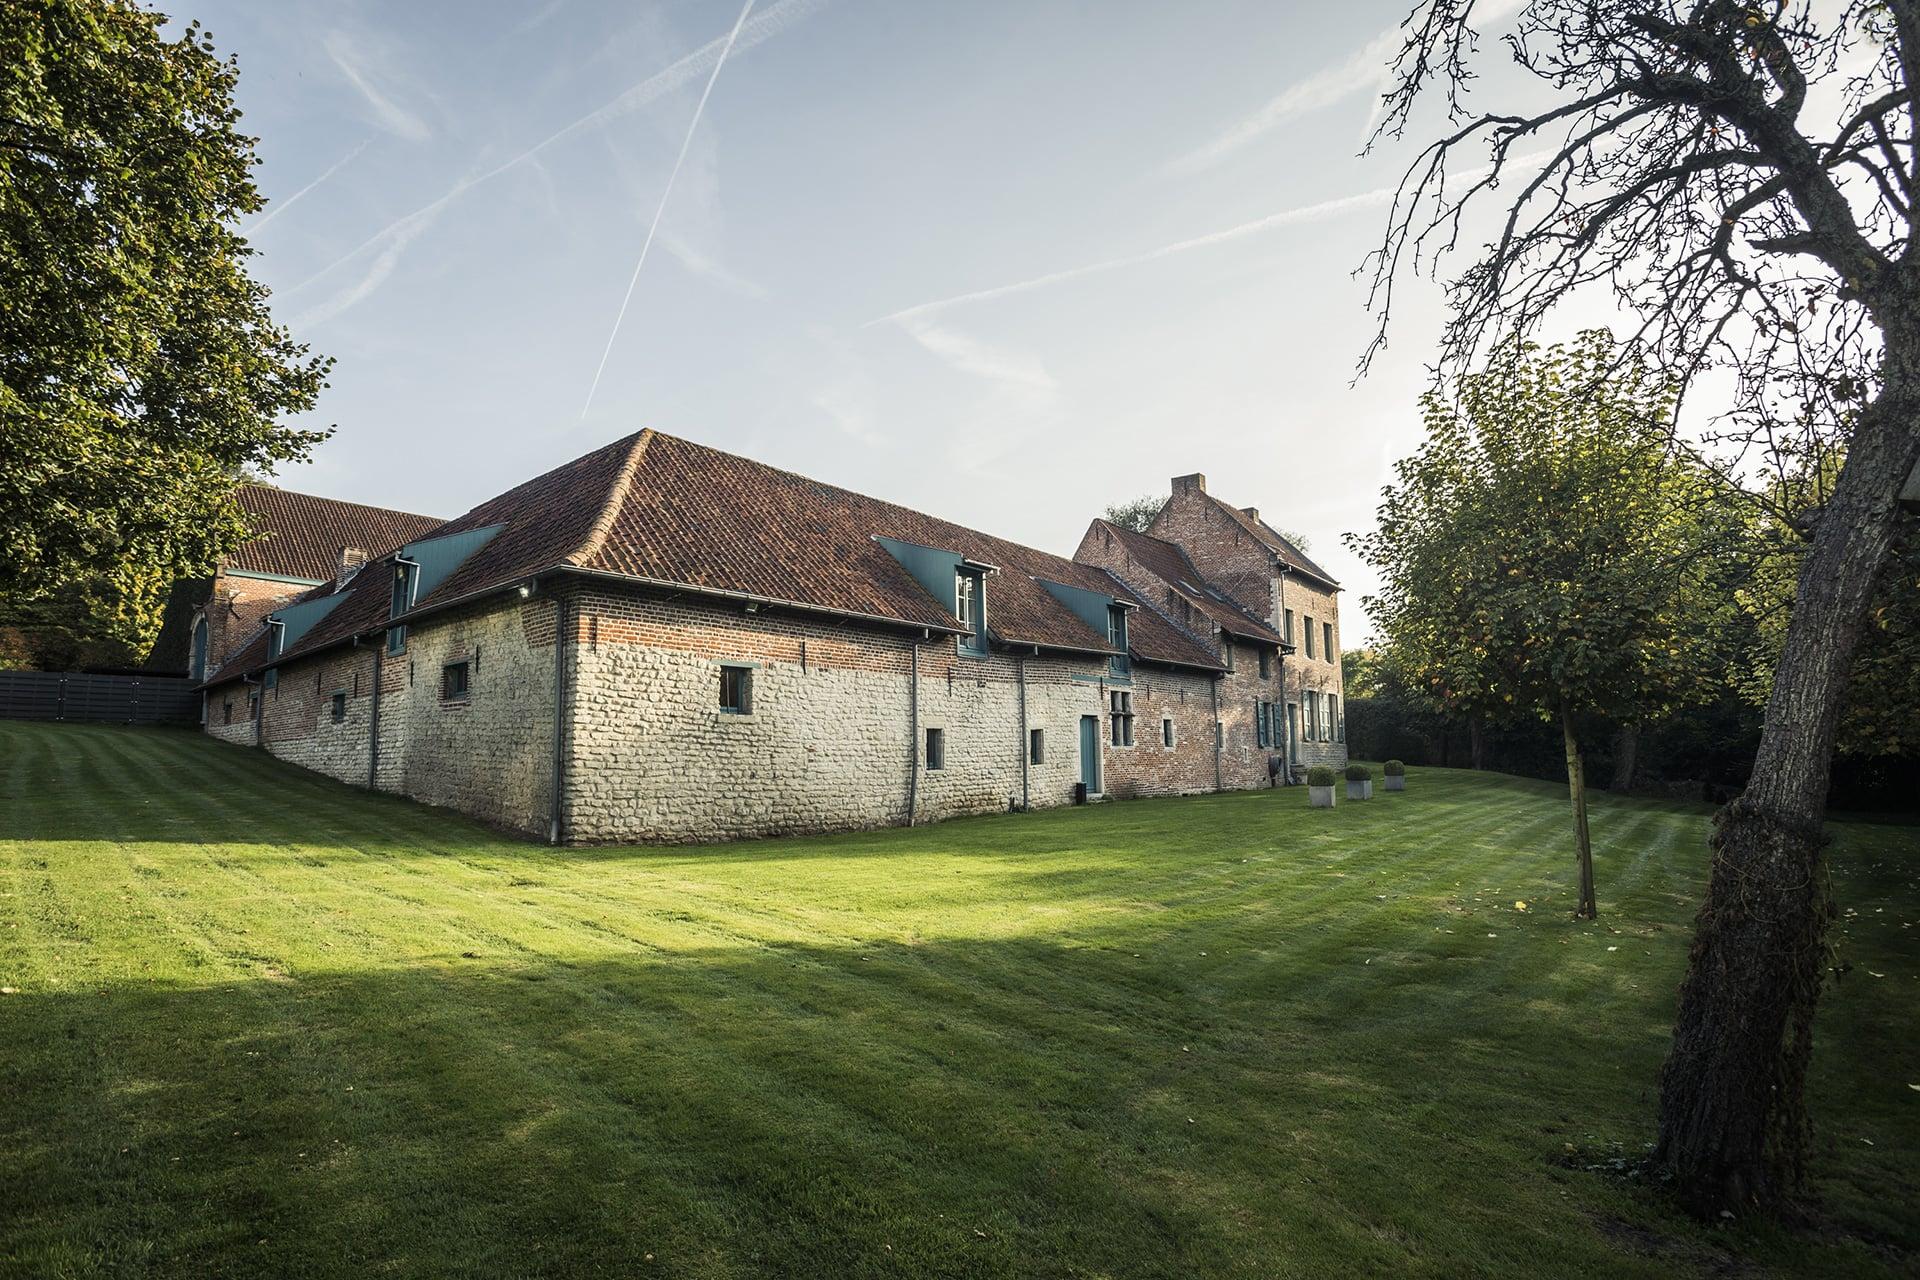 Historiek - Hof ter Musschen